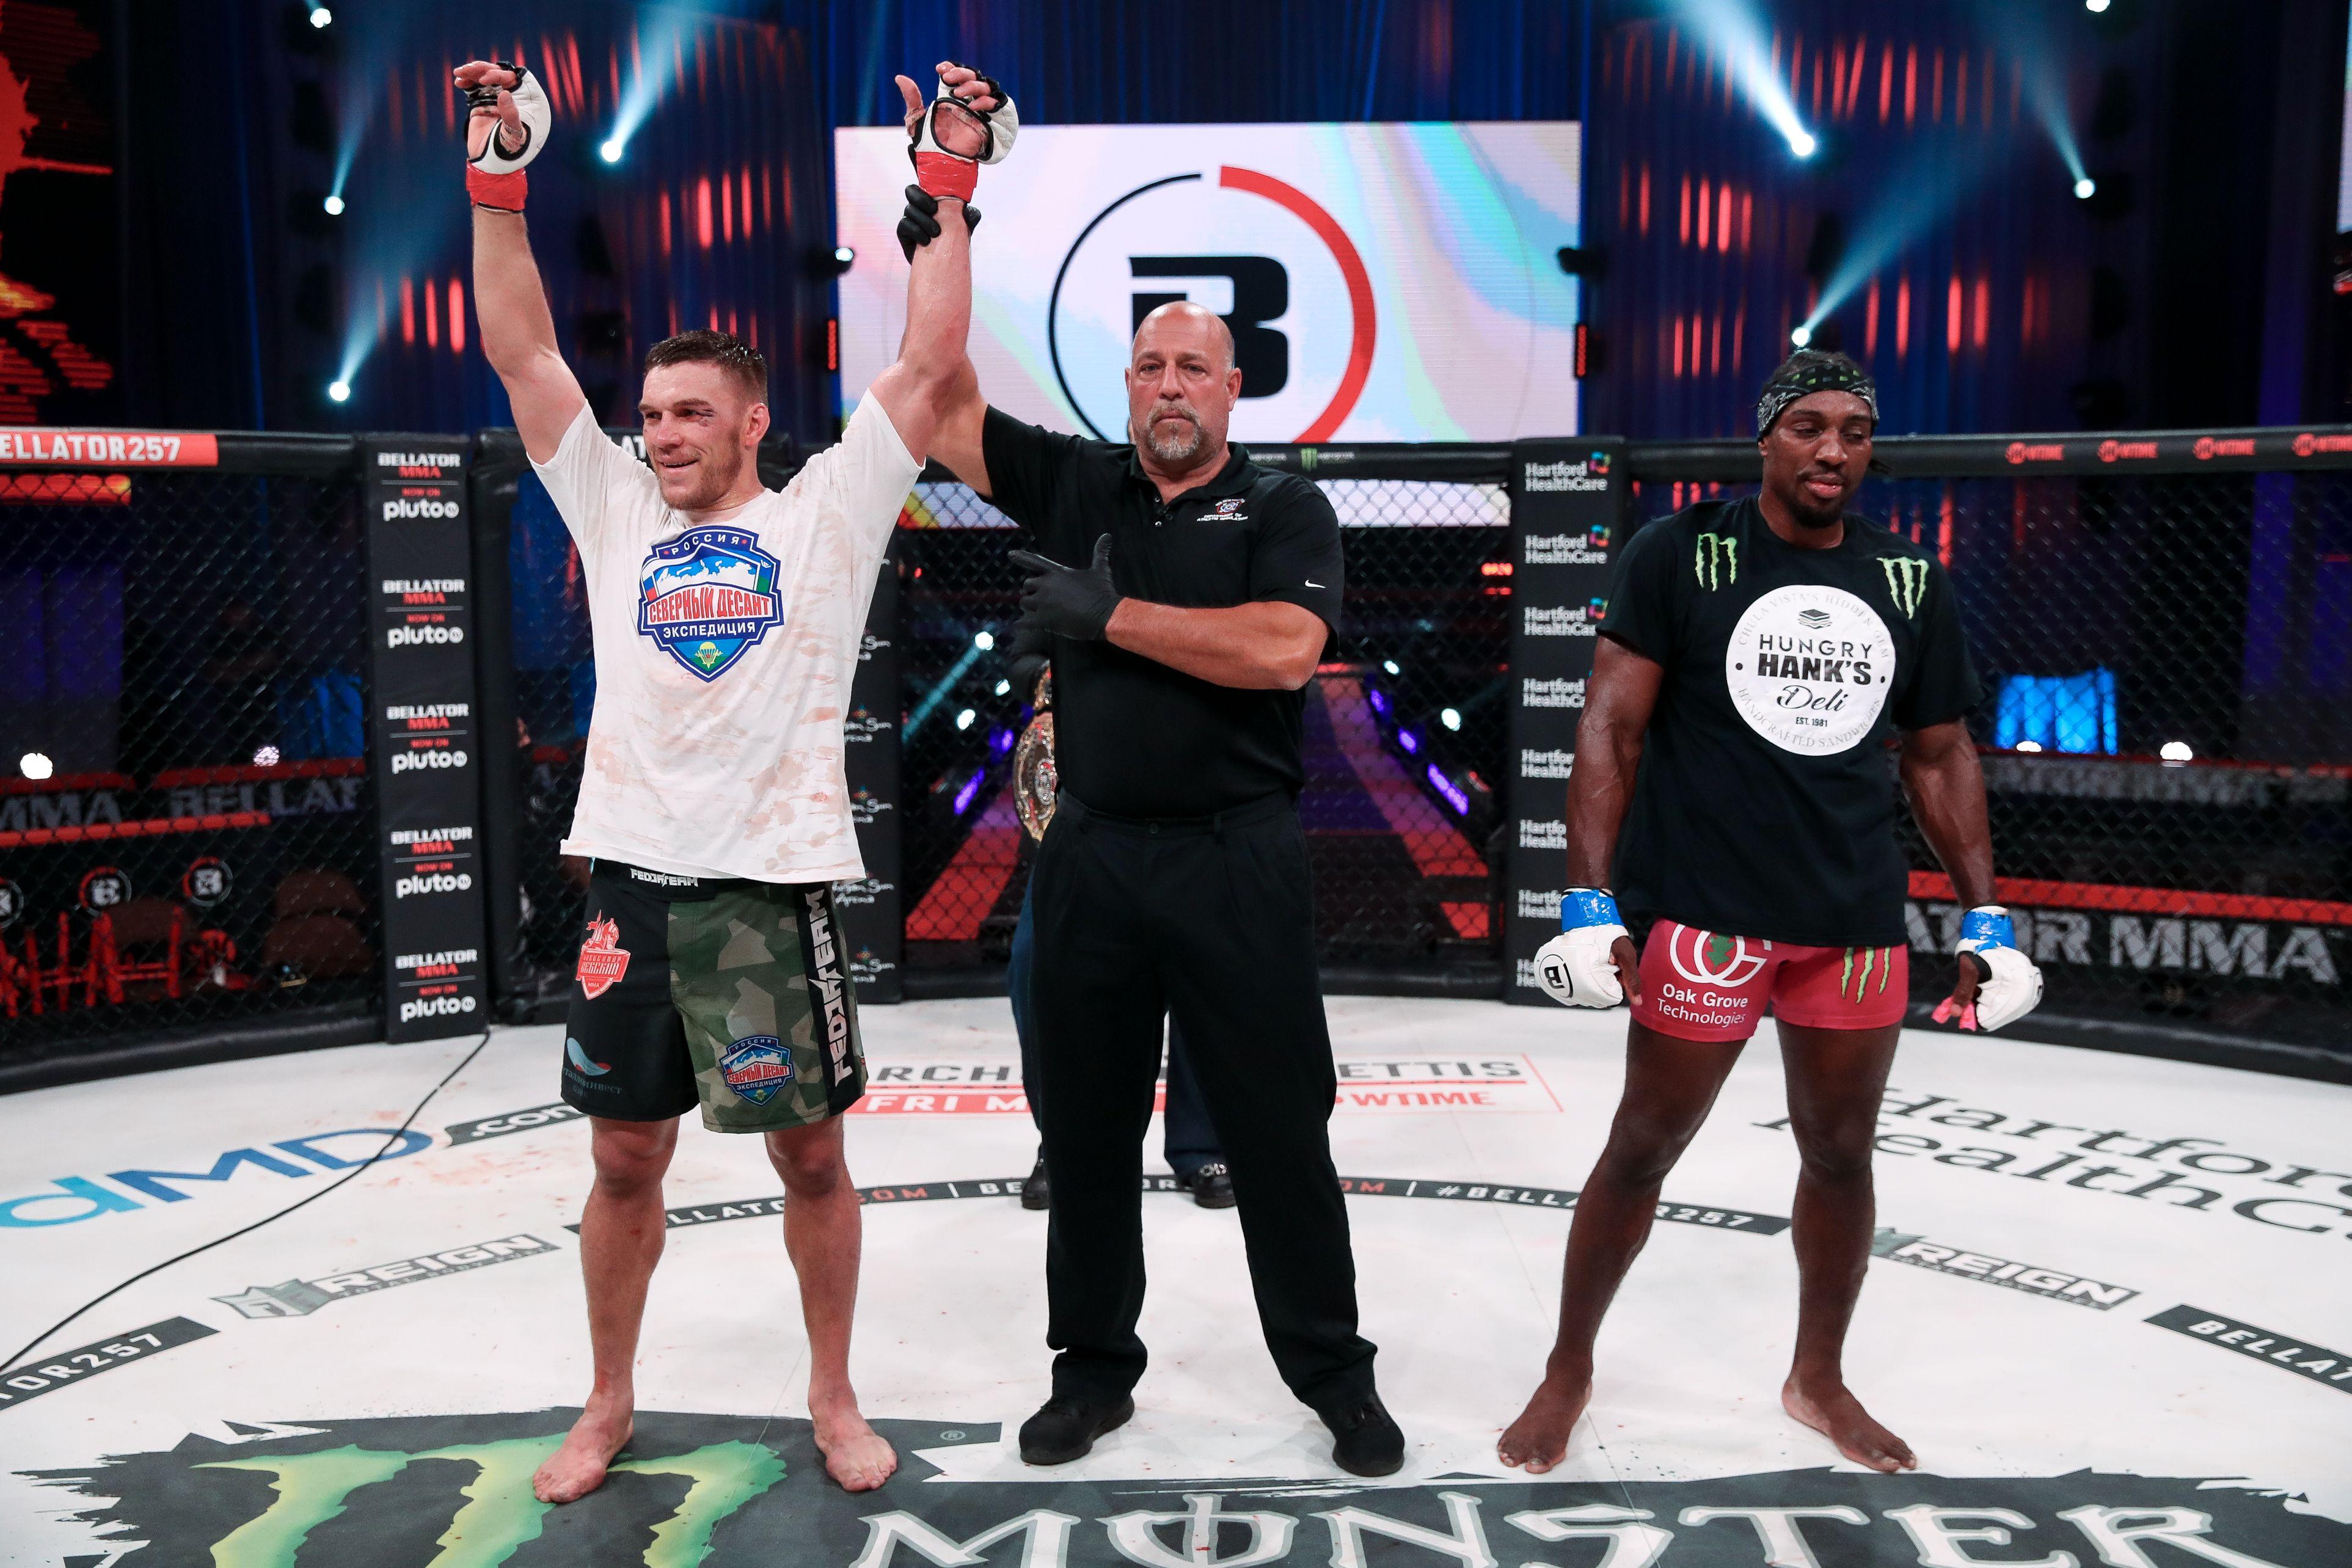 Вадим Немков защити успешно титлата си в Белатор